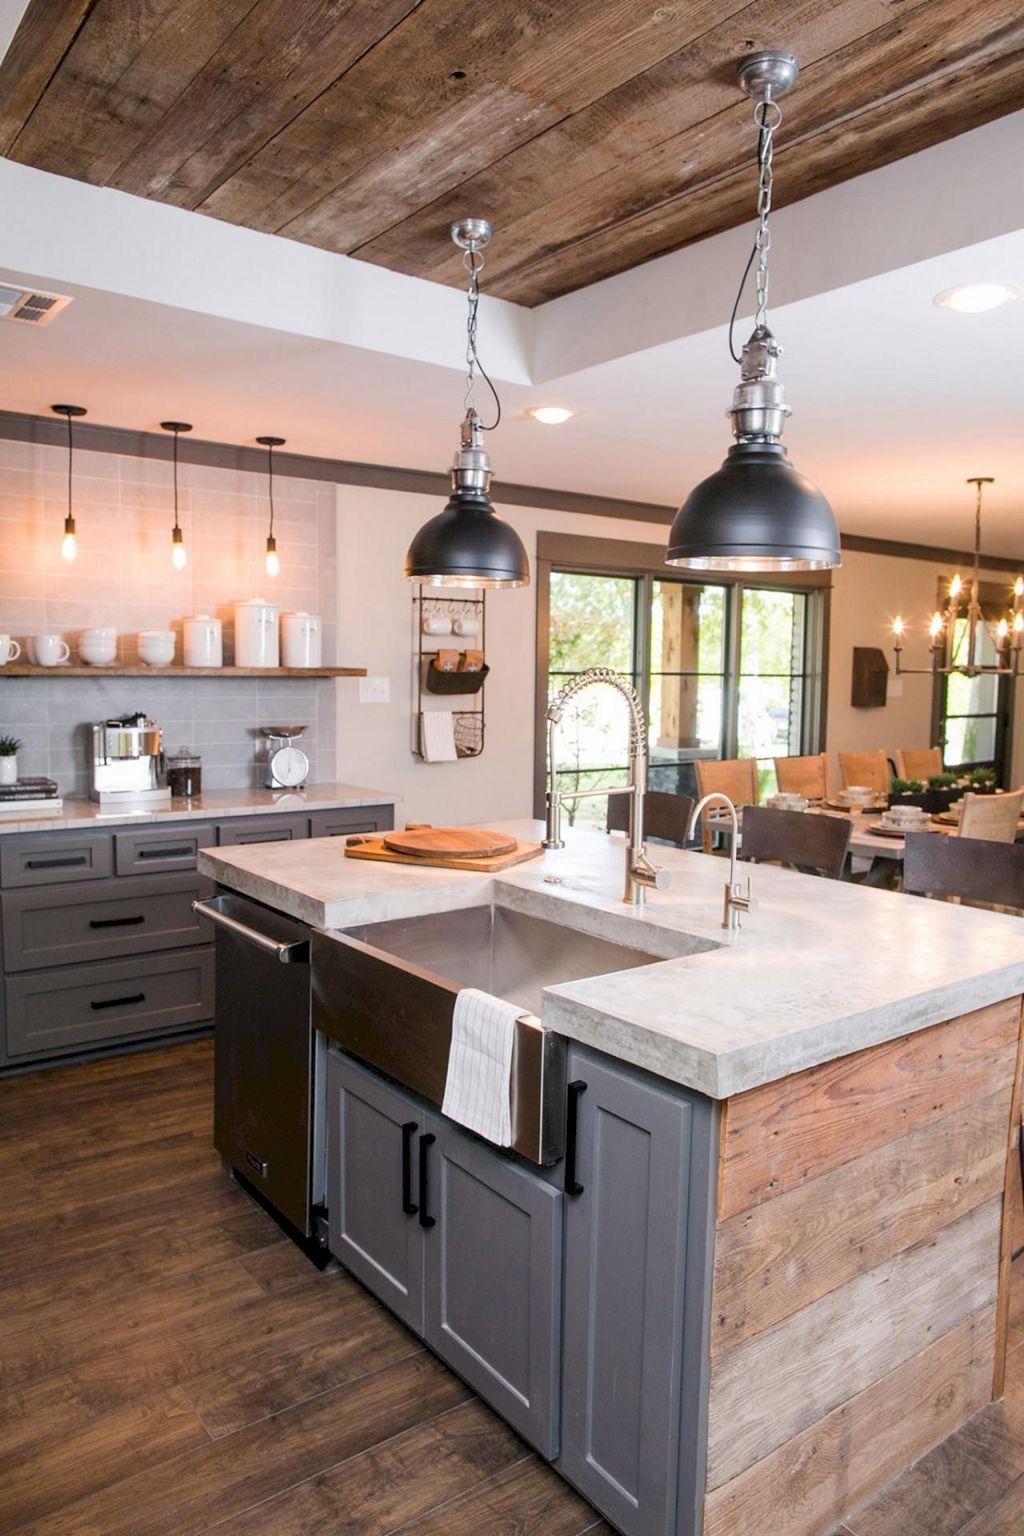 best modern farmhouse kitchen design ideas 27 on best farmhouse kitchen decor ideas and remodel create your dreams id=50989